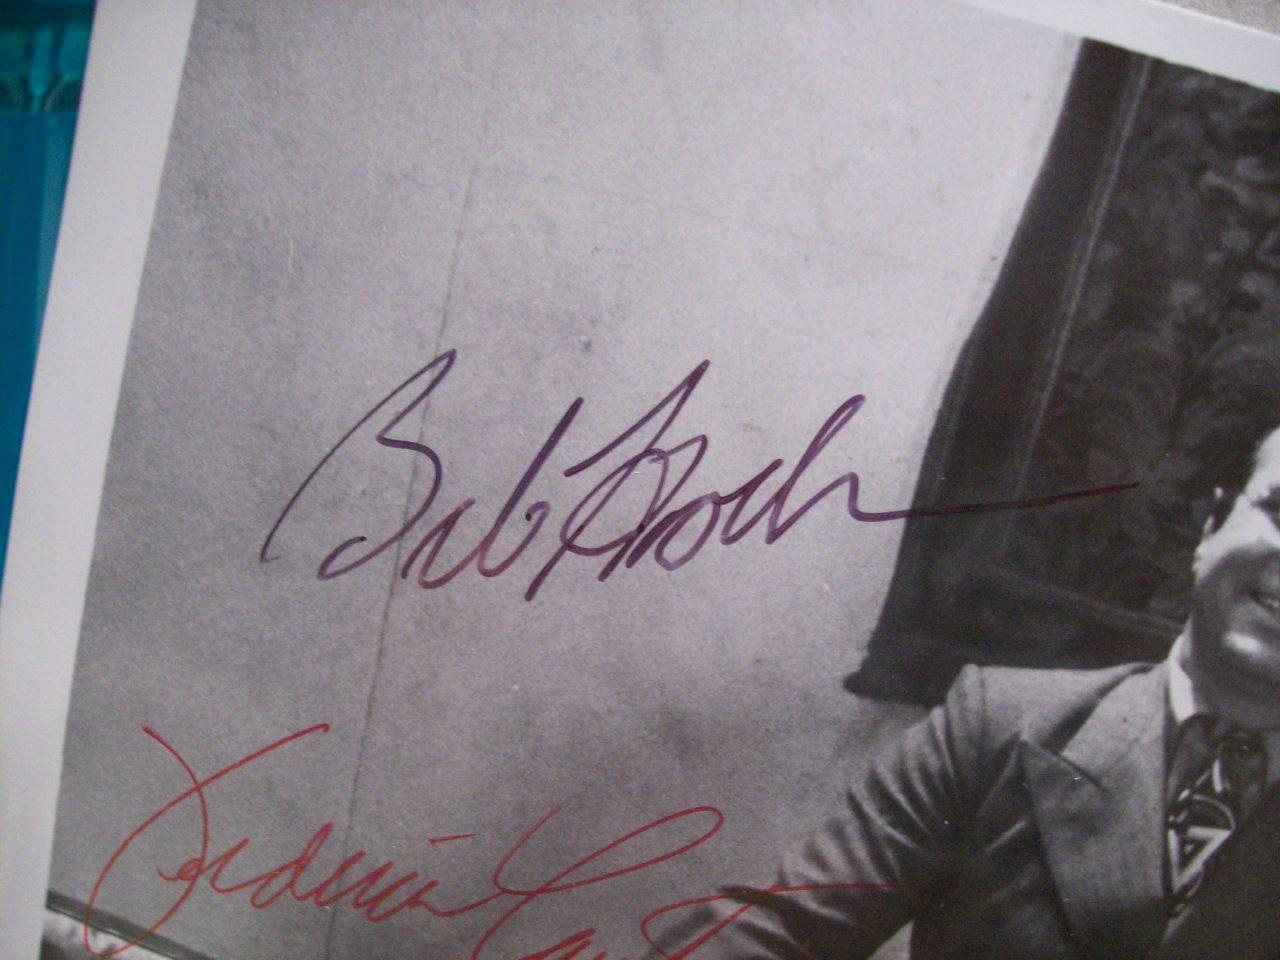 Hoskins, Bob Veronica Cartwright Richard Dreyfuss Photo Signed Autograph Inserts 1976